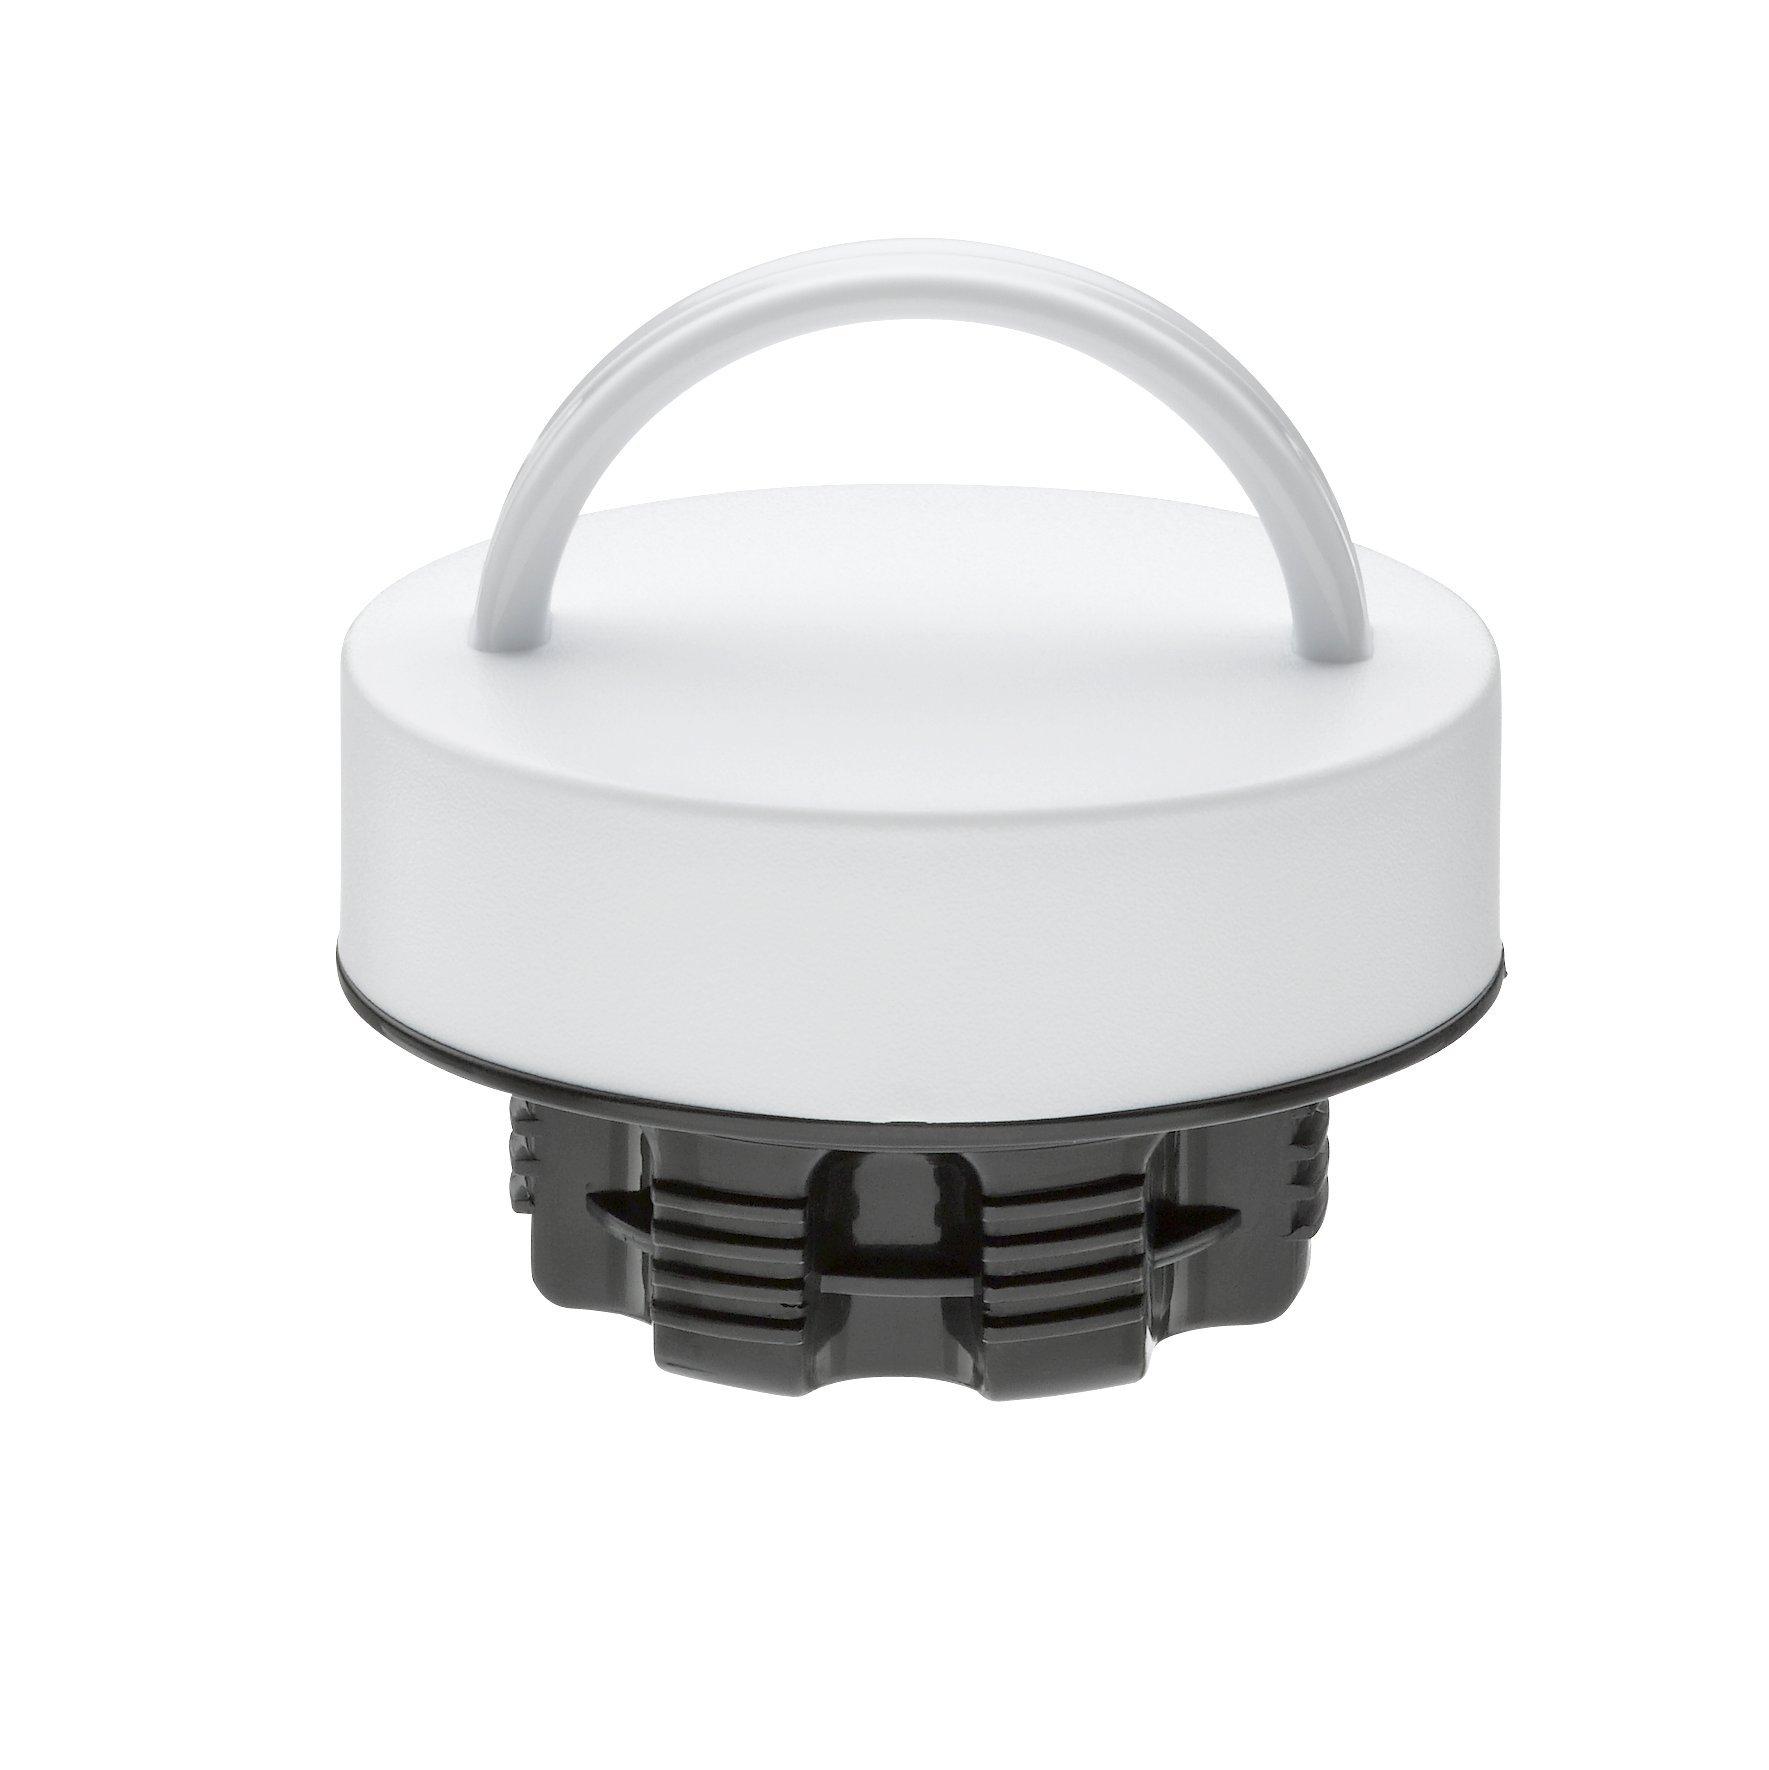 Alfi Dan 1-Liter Carafe, White by Kaiser